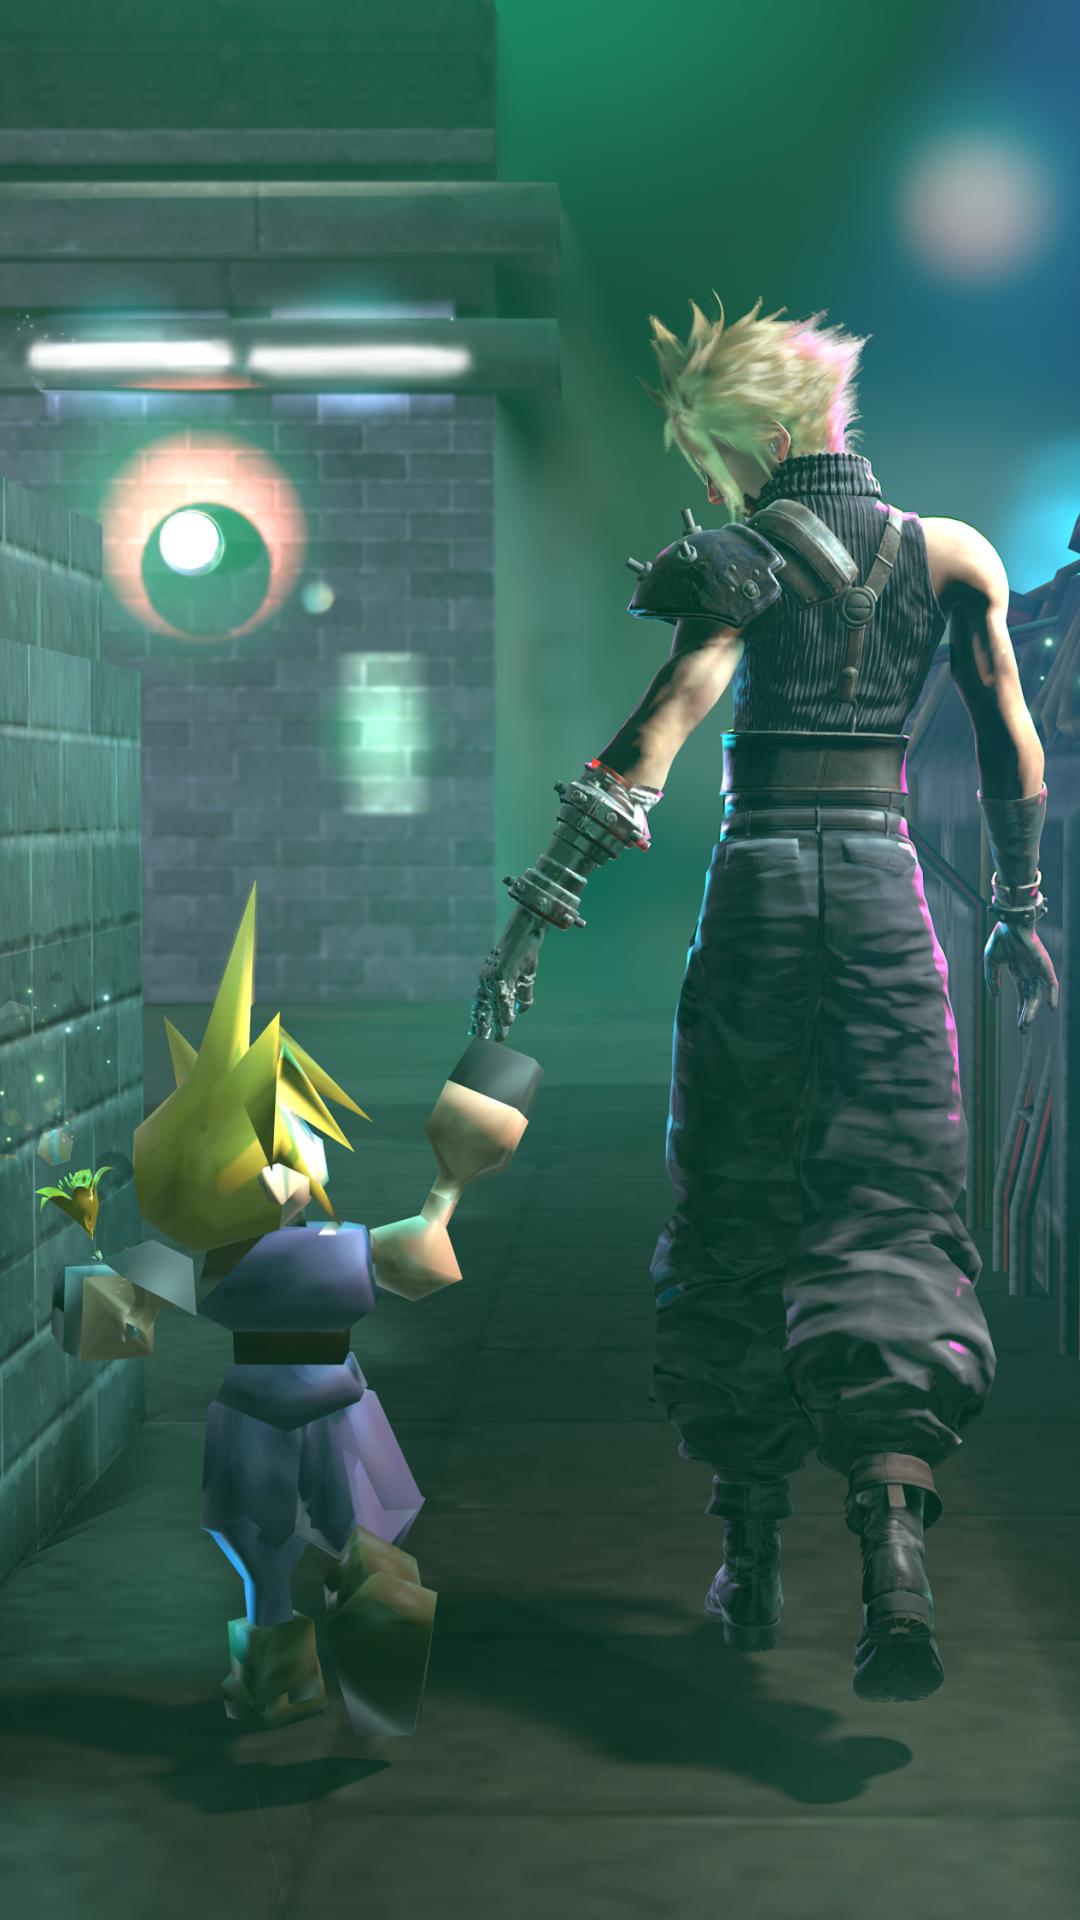 Final Fantasy 7 HD Phone Wallpapers - Wallpaper Cave